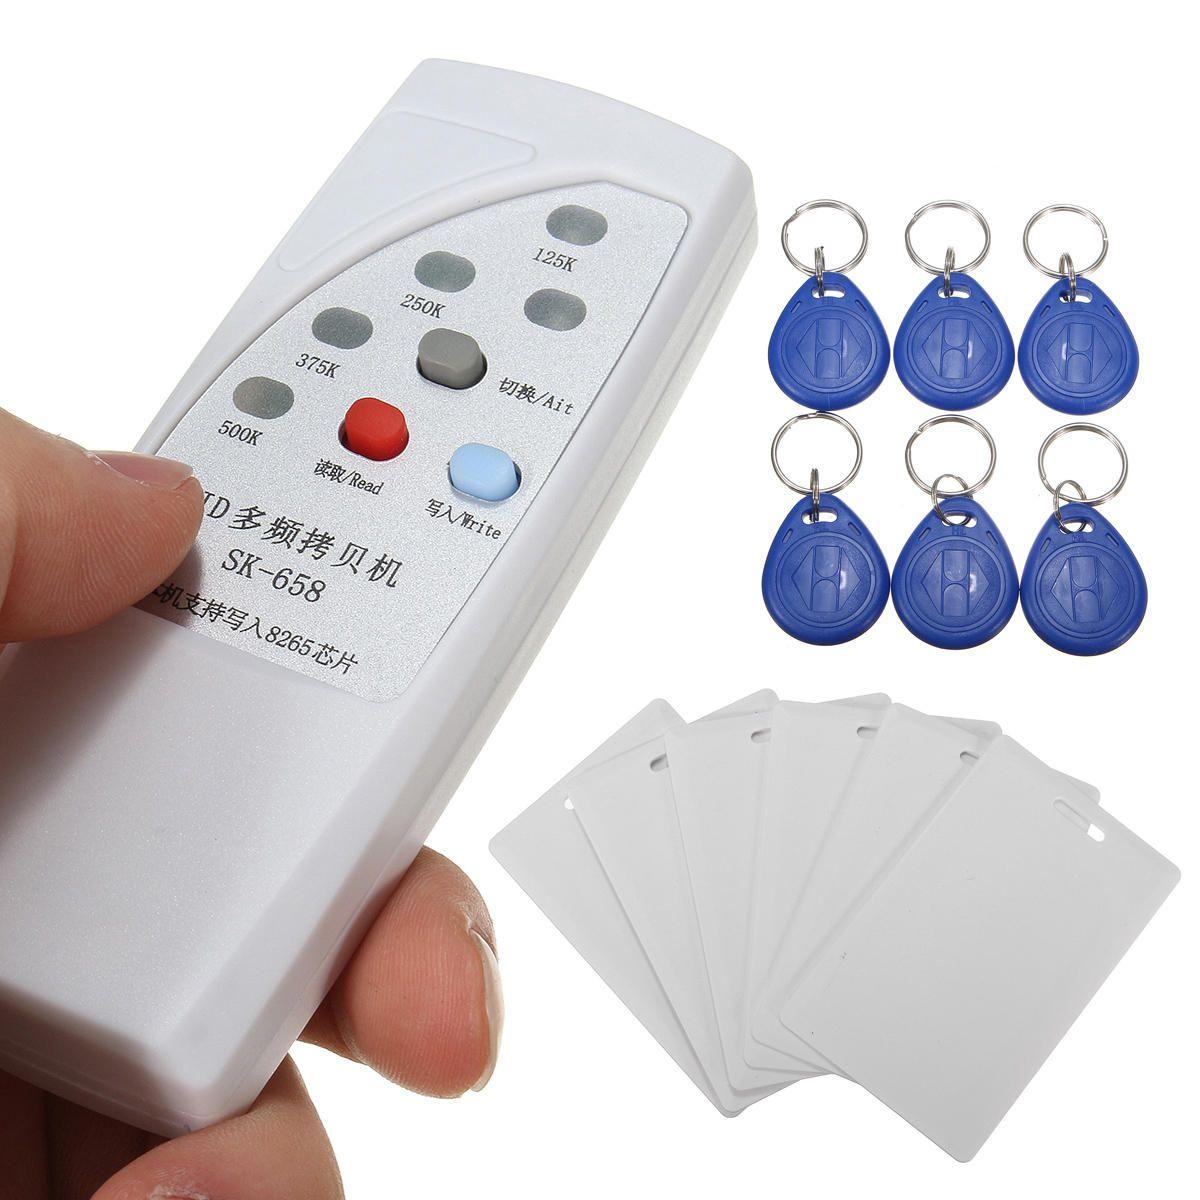 Daniu SK-658 13 Pezzi 125KHz RFID ID Card Reader Writer Copier duplicatore con 6 CardsTags Kit